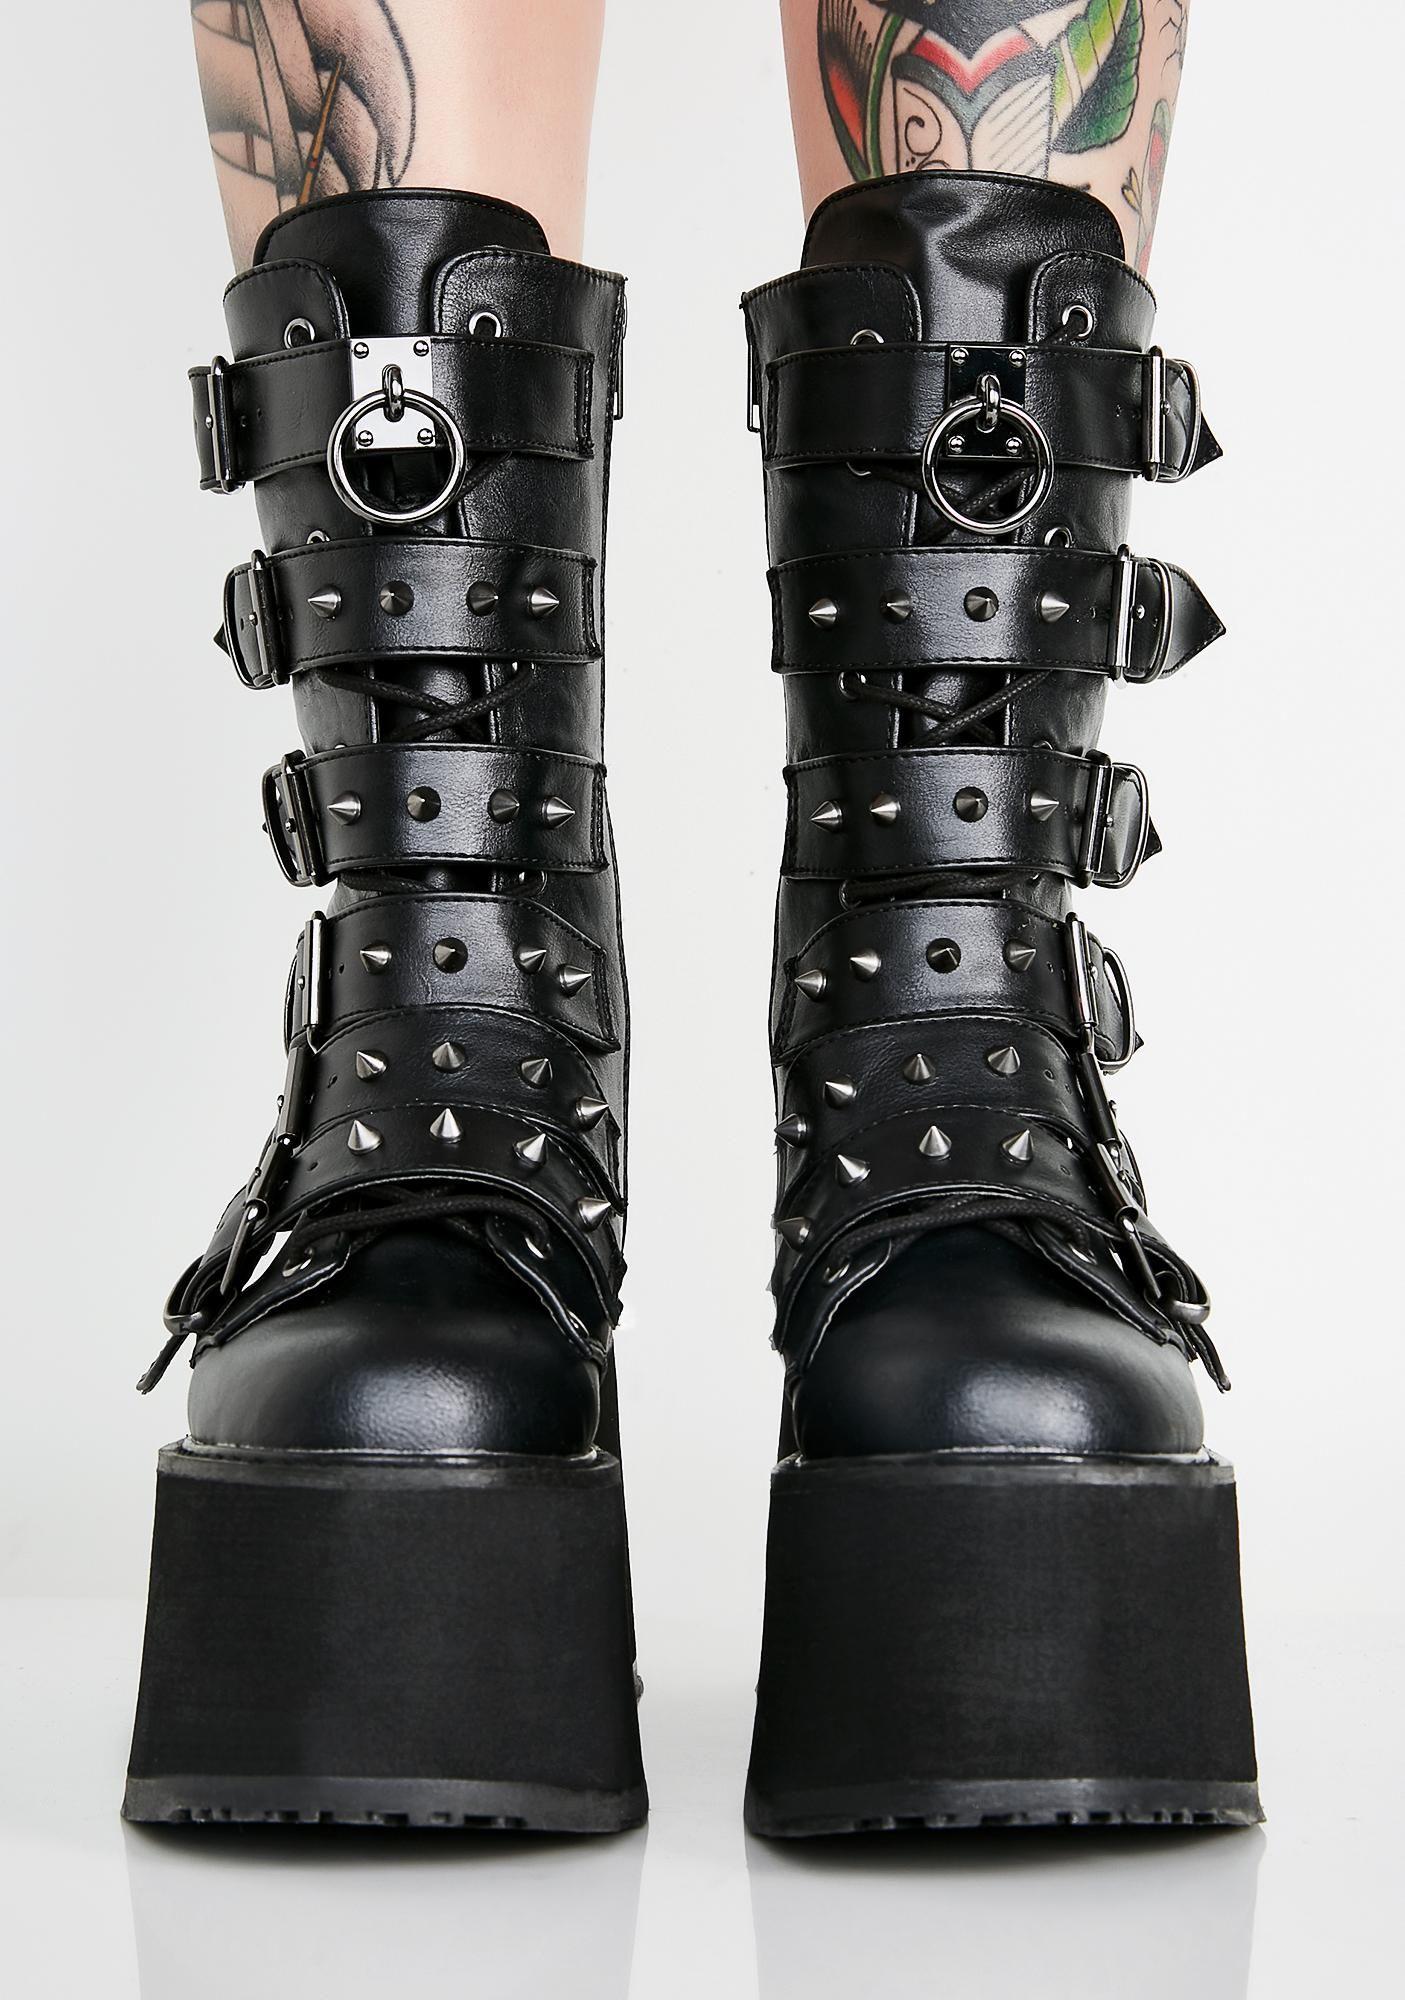 Demonia Shaker 52 Black Matte Platform 4.5 Wedge Goth Punk